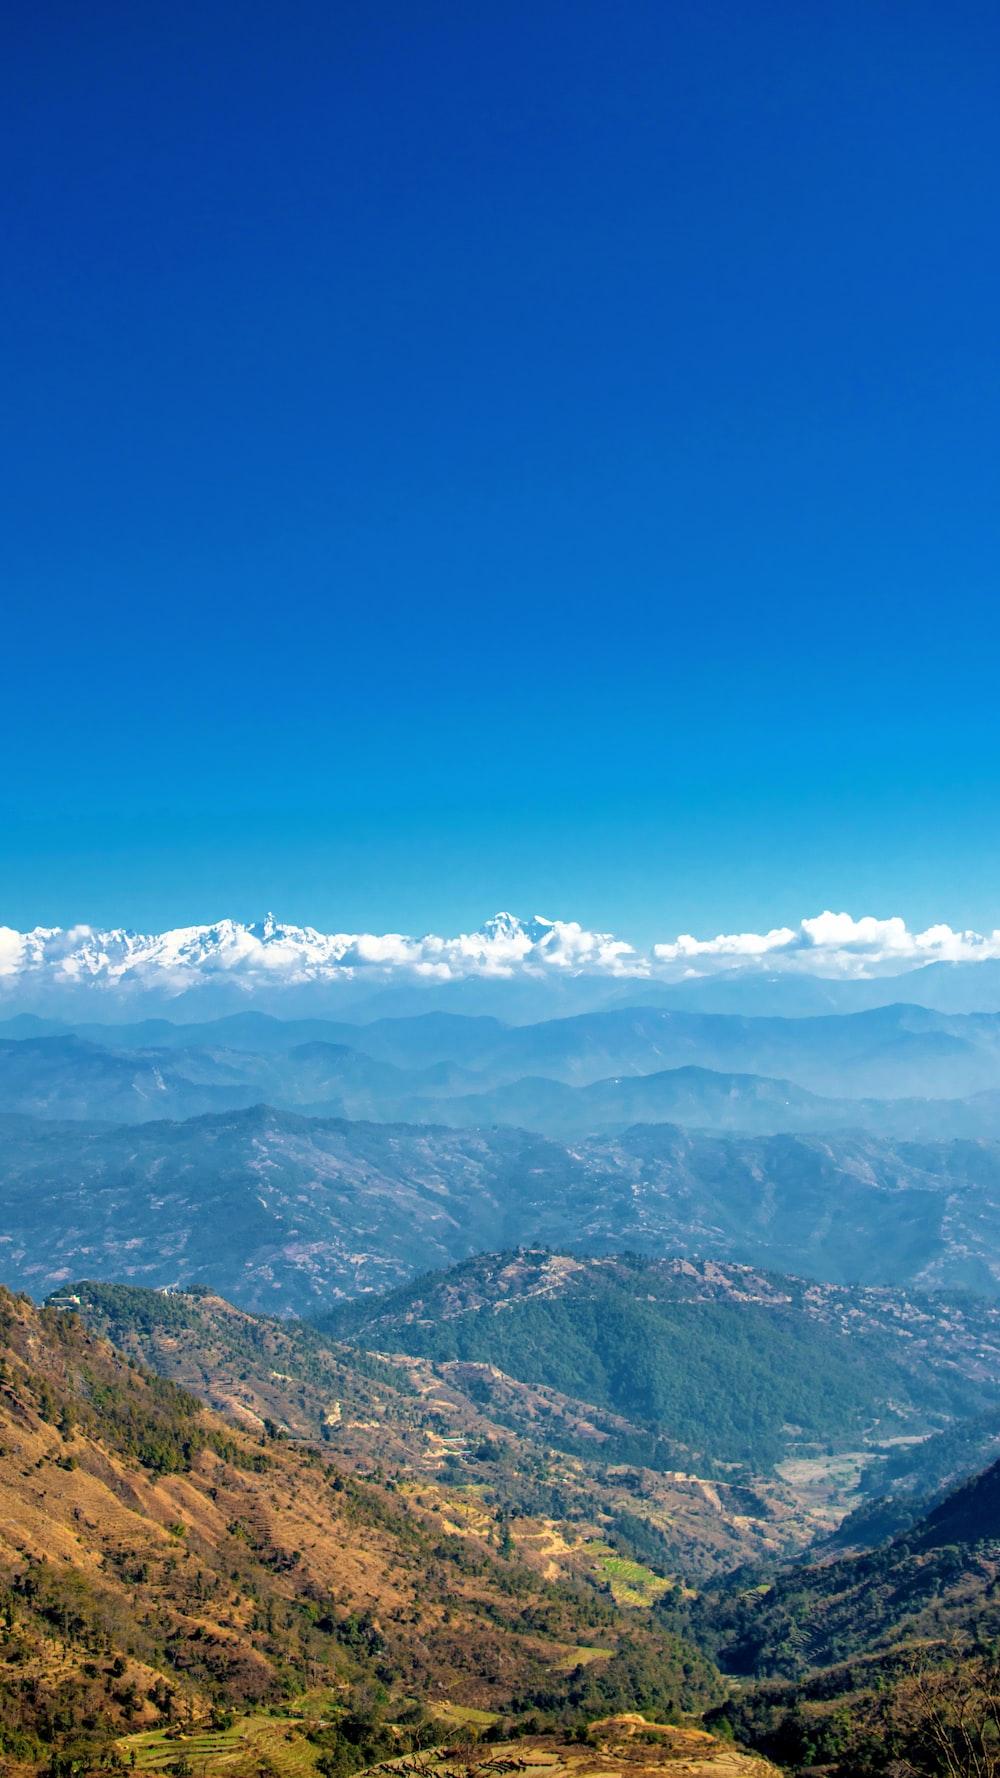 mountain ranges under blue clouds